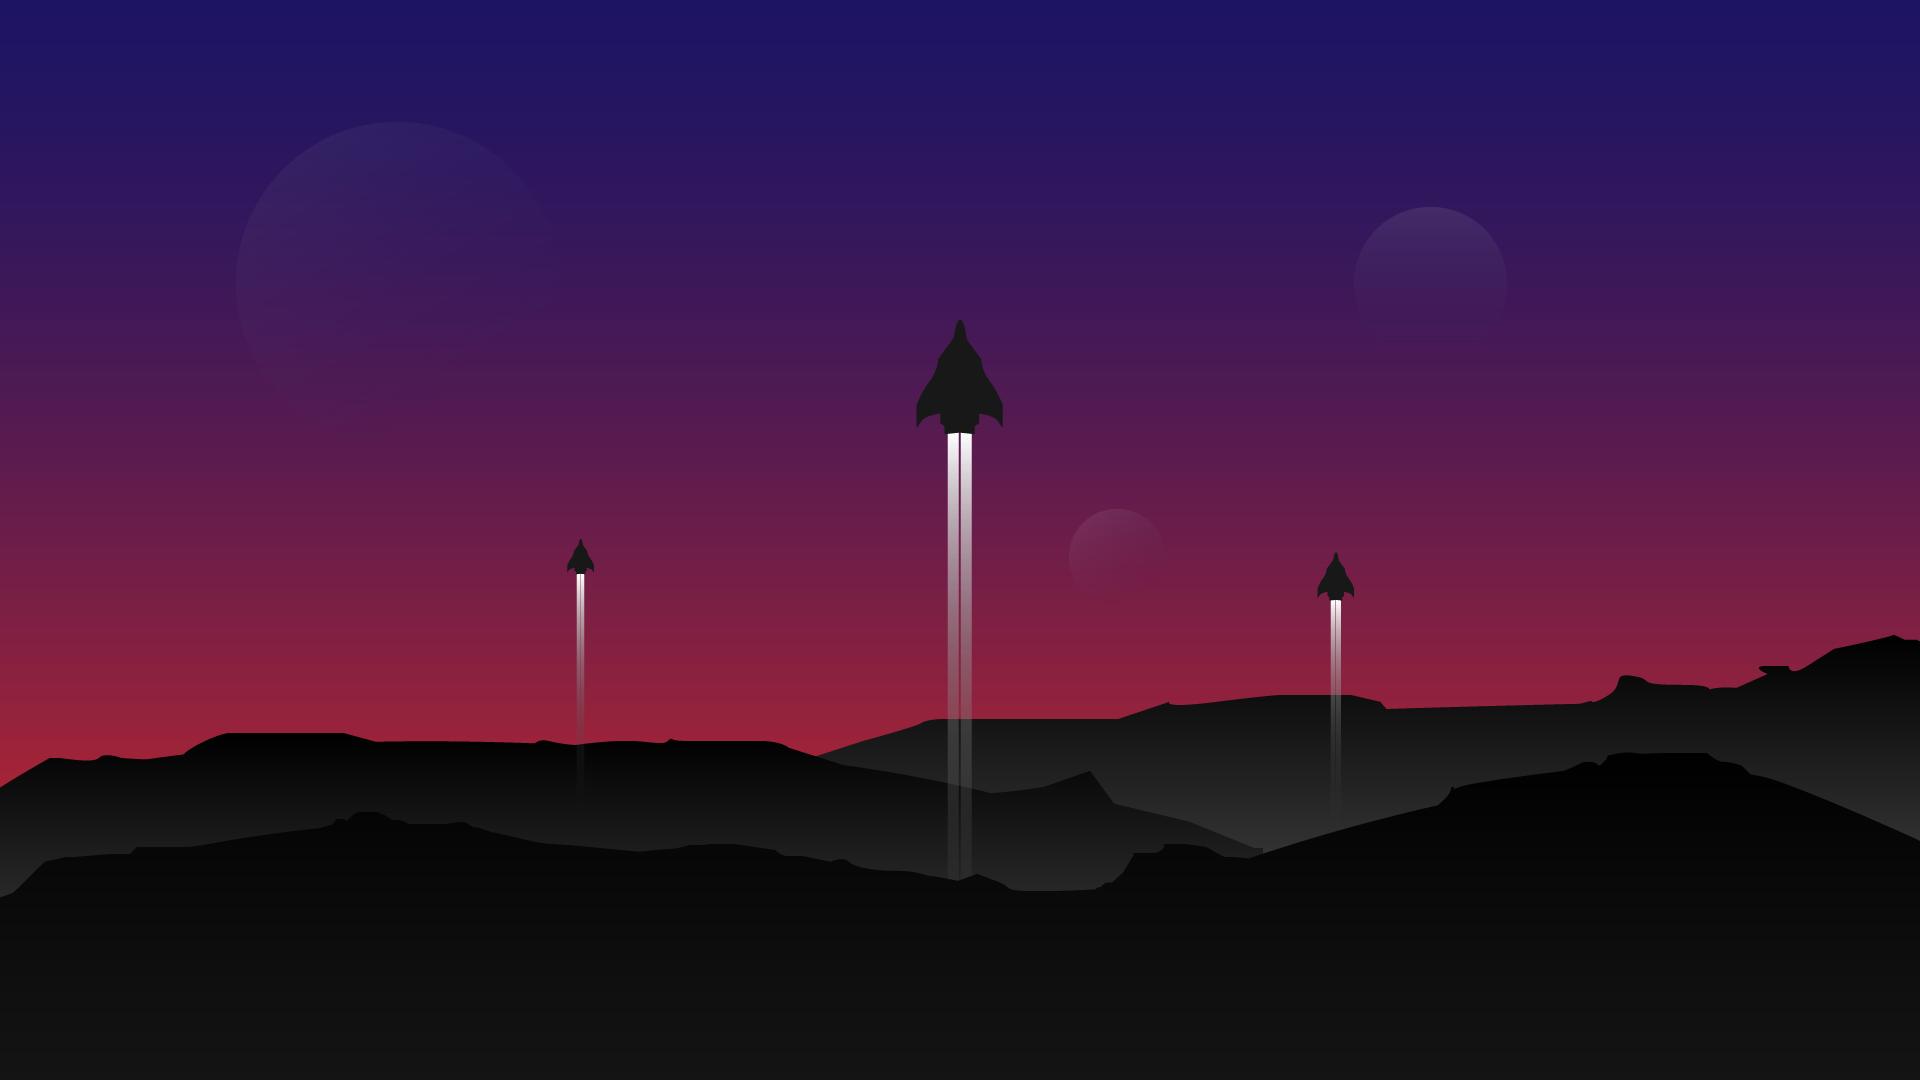 spaceship space launching futuristic minimalistic pc laptop macbook and chromebook wallpaper 4k